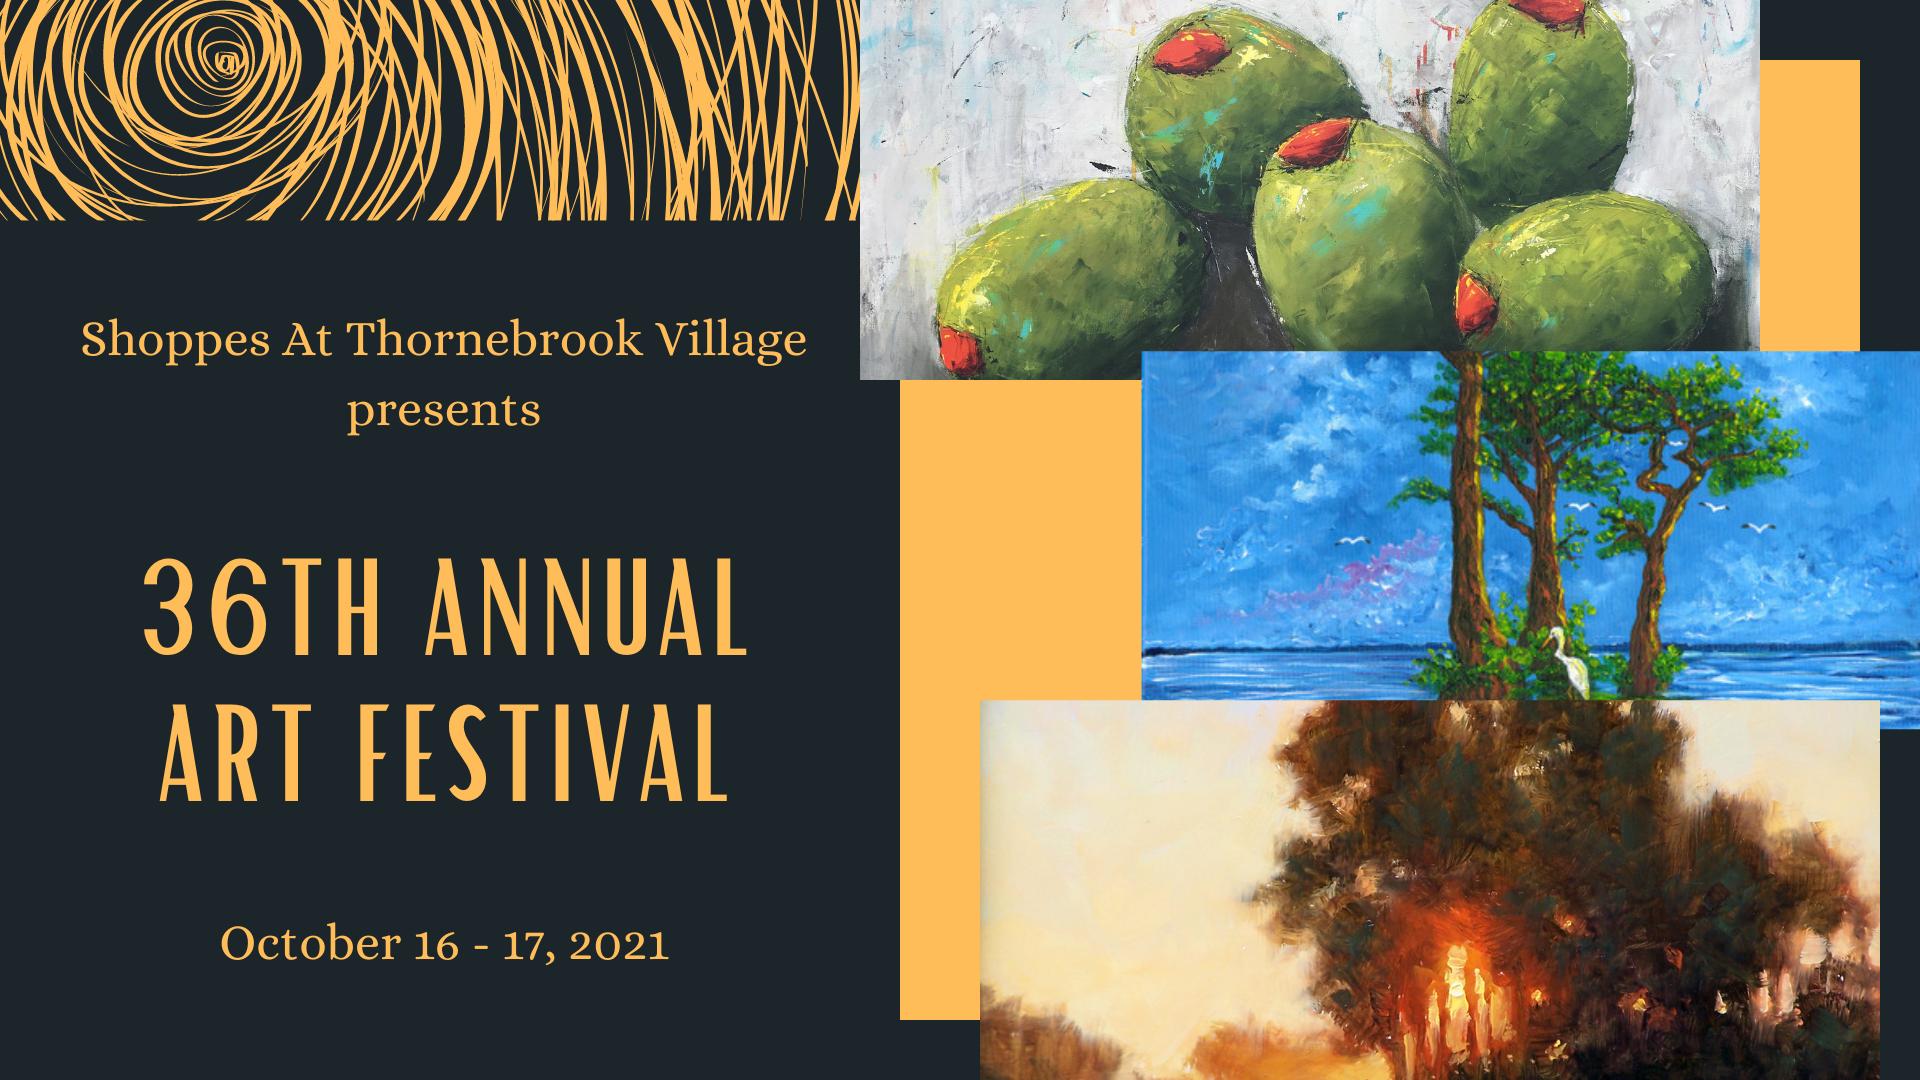 36th-Annual-Art-Festival-at-Thornebrook